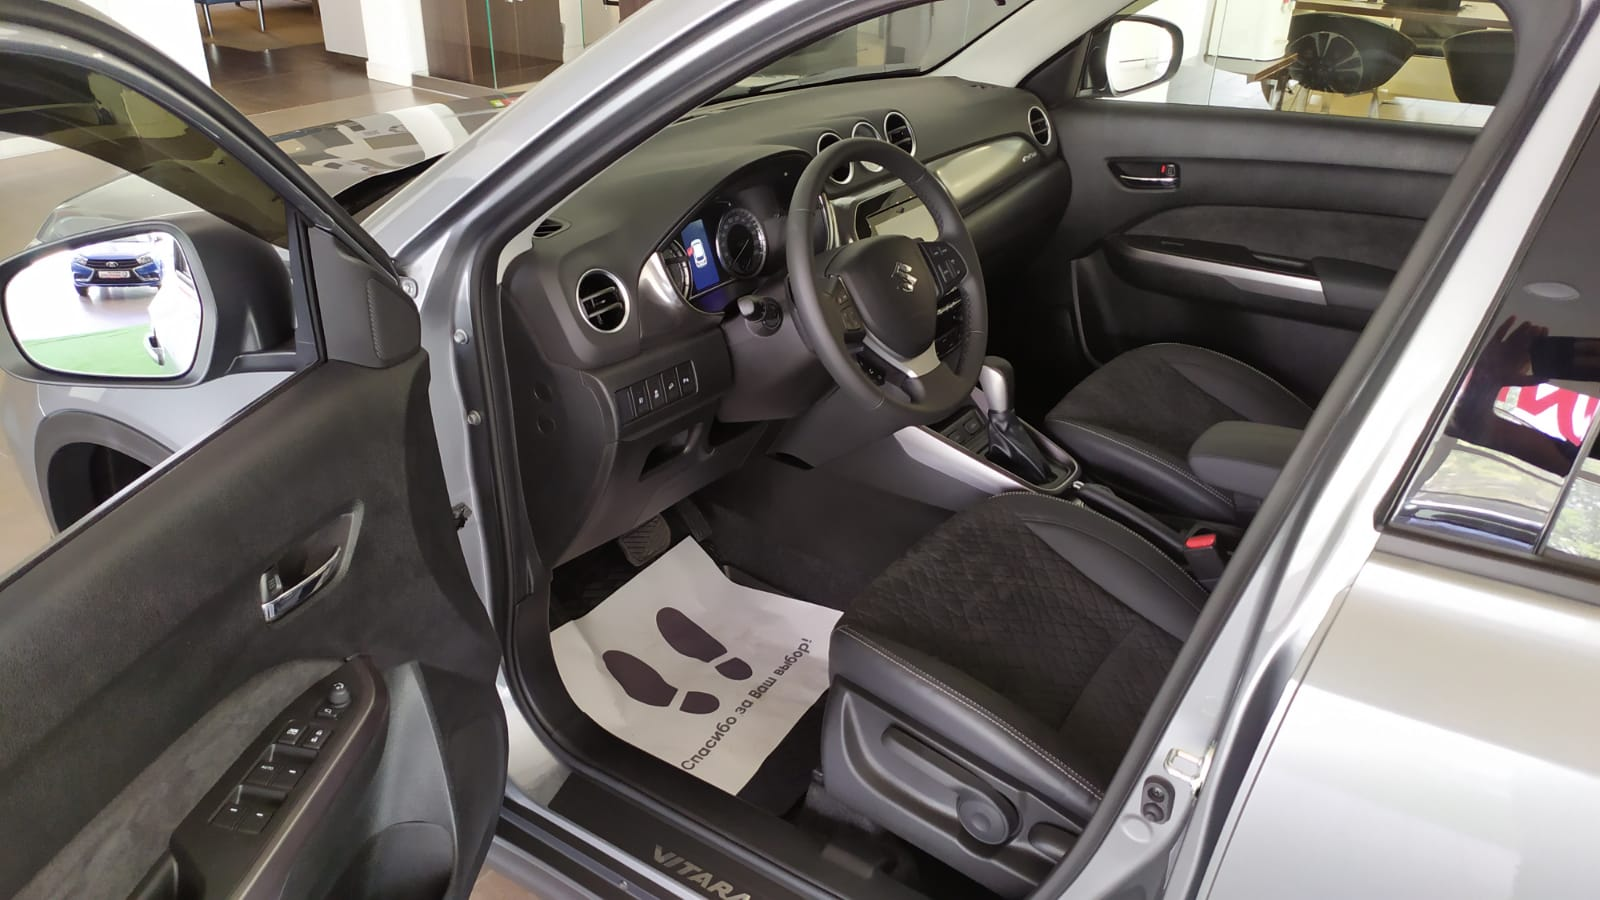 SUZUKI VITARA 1.6 л (117 л.с.) 4WD, 6-АКПП, GLХ, Серый, 2021